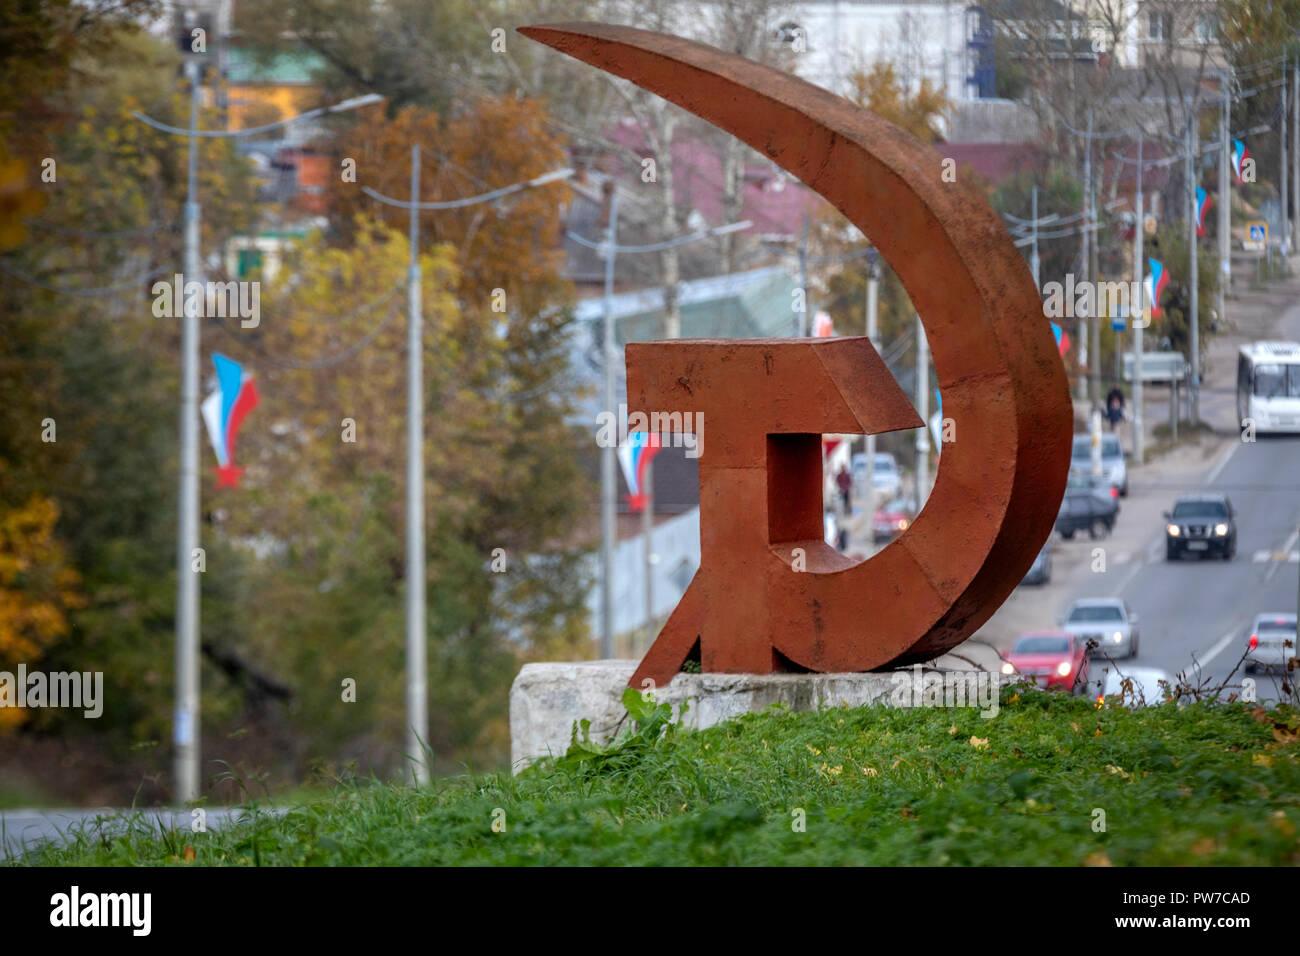 Stele 'Hammer and Sickle' installed on Moskovskaya Street in Pereslavl-Zalessky town of Yaroslavl Region, Russia - Stock Image